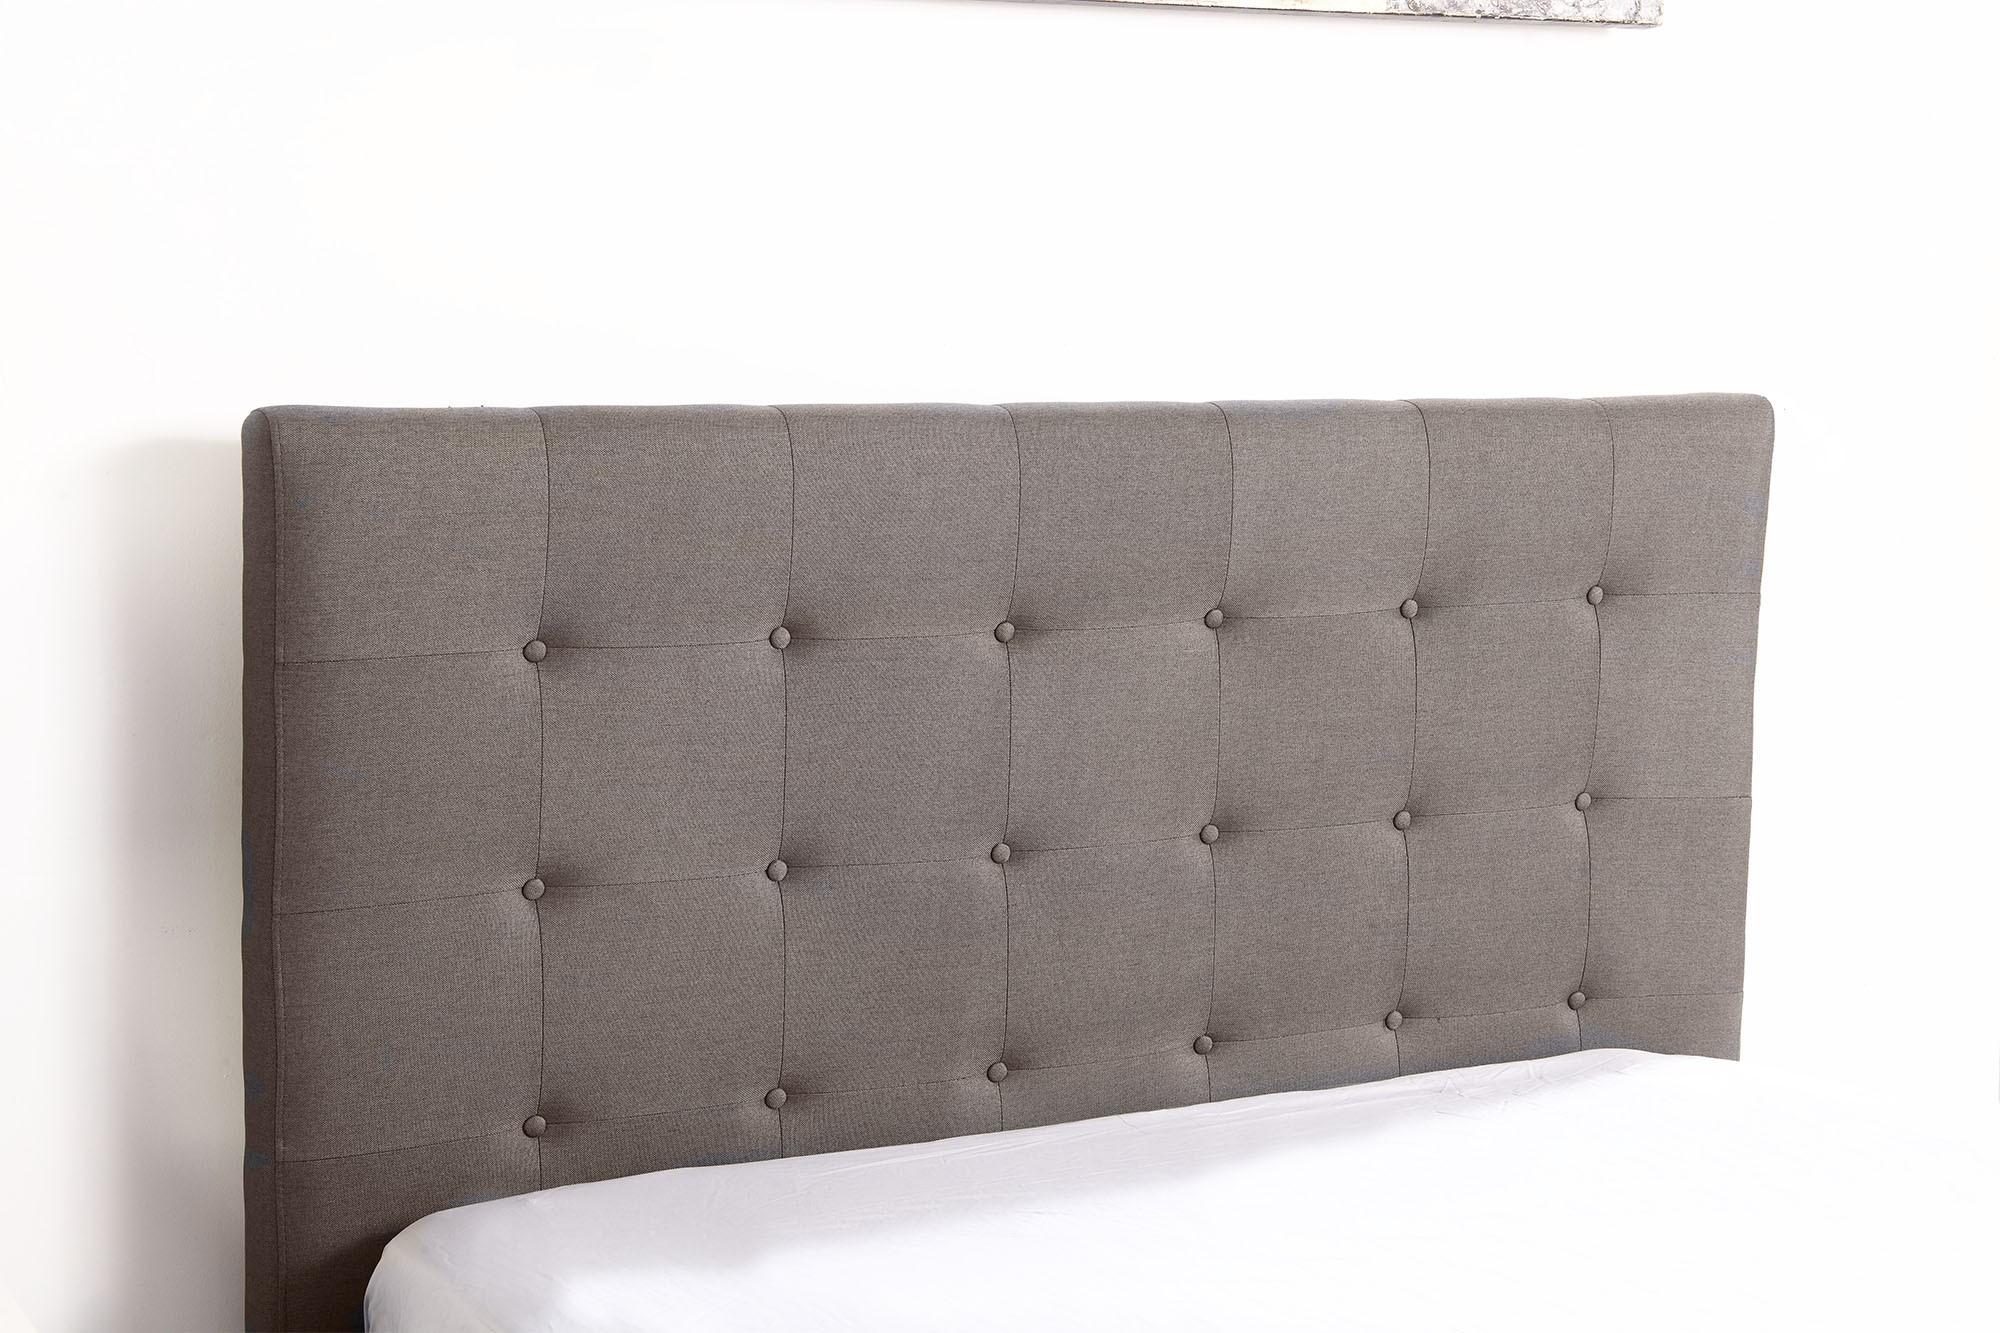 lit coffre layton sommier 160cm tissu taupe. Black Bedroom Furniture Sets. Home Design Ideas